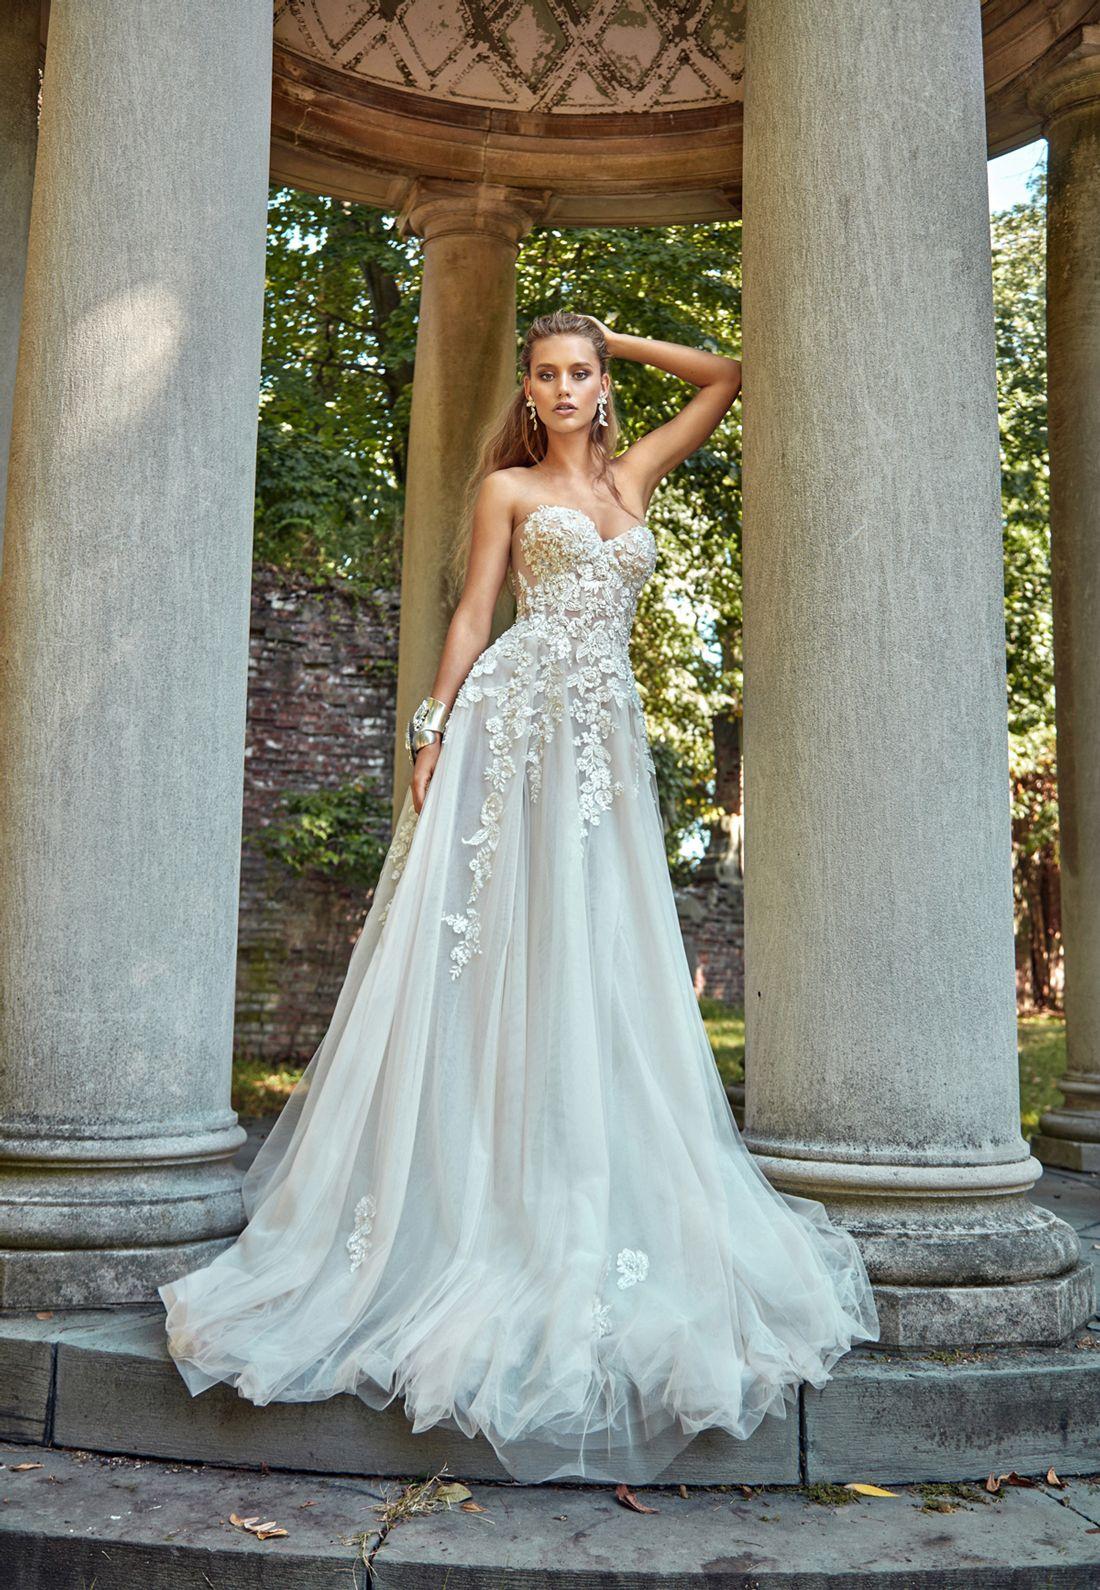 GaliaLahav -- Gia is a sheer strapless corset dress, with sheer ...